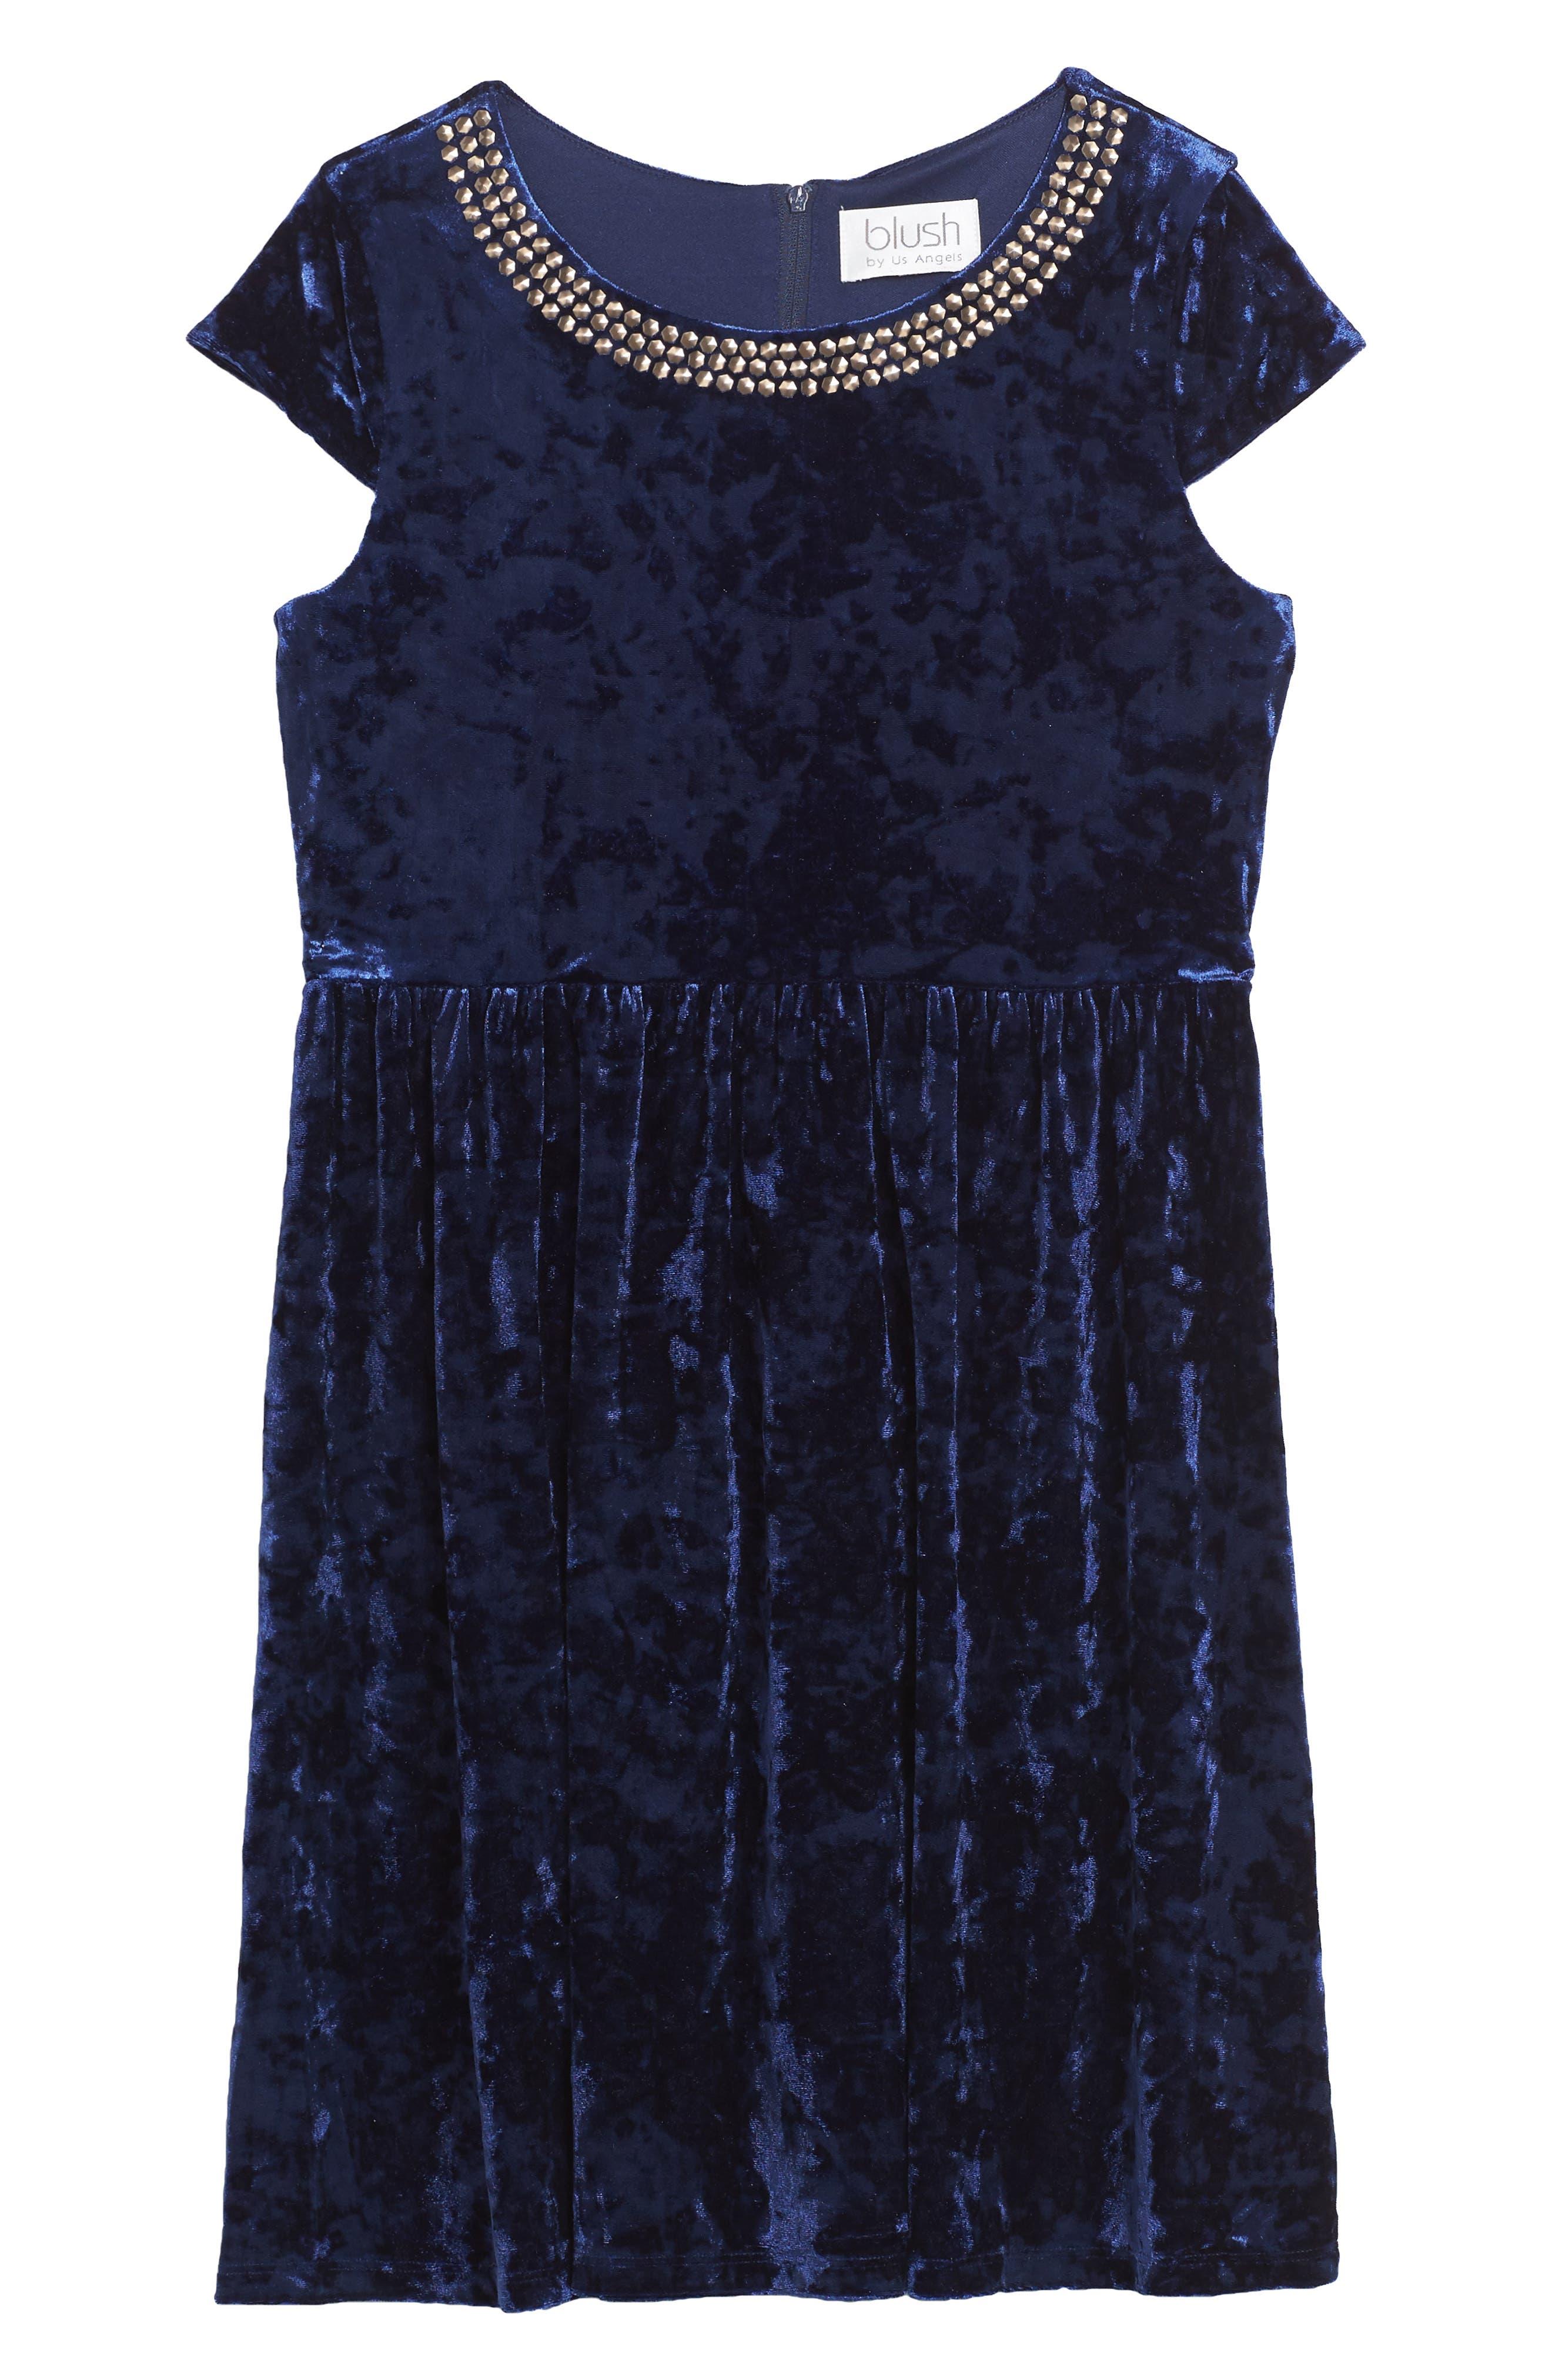 Blue dress size 6x black